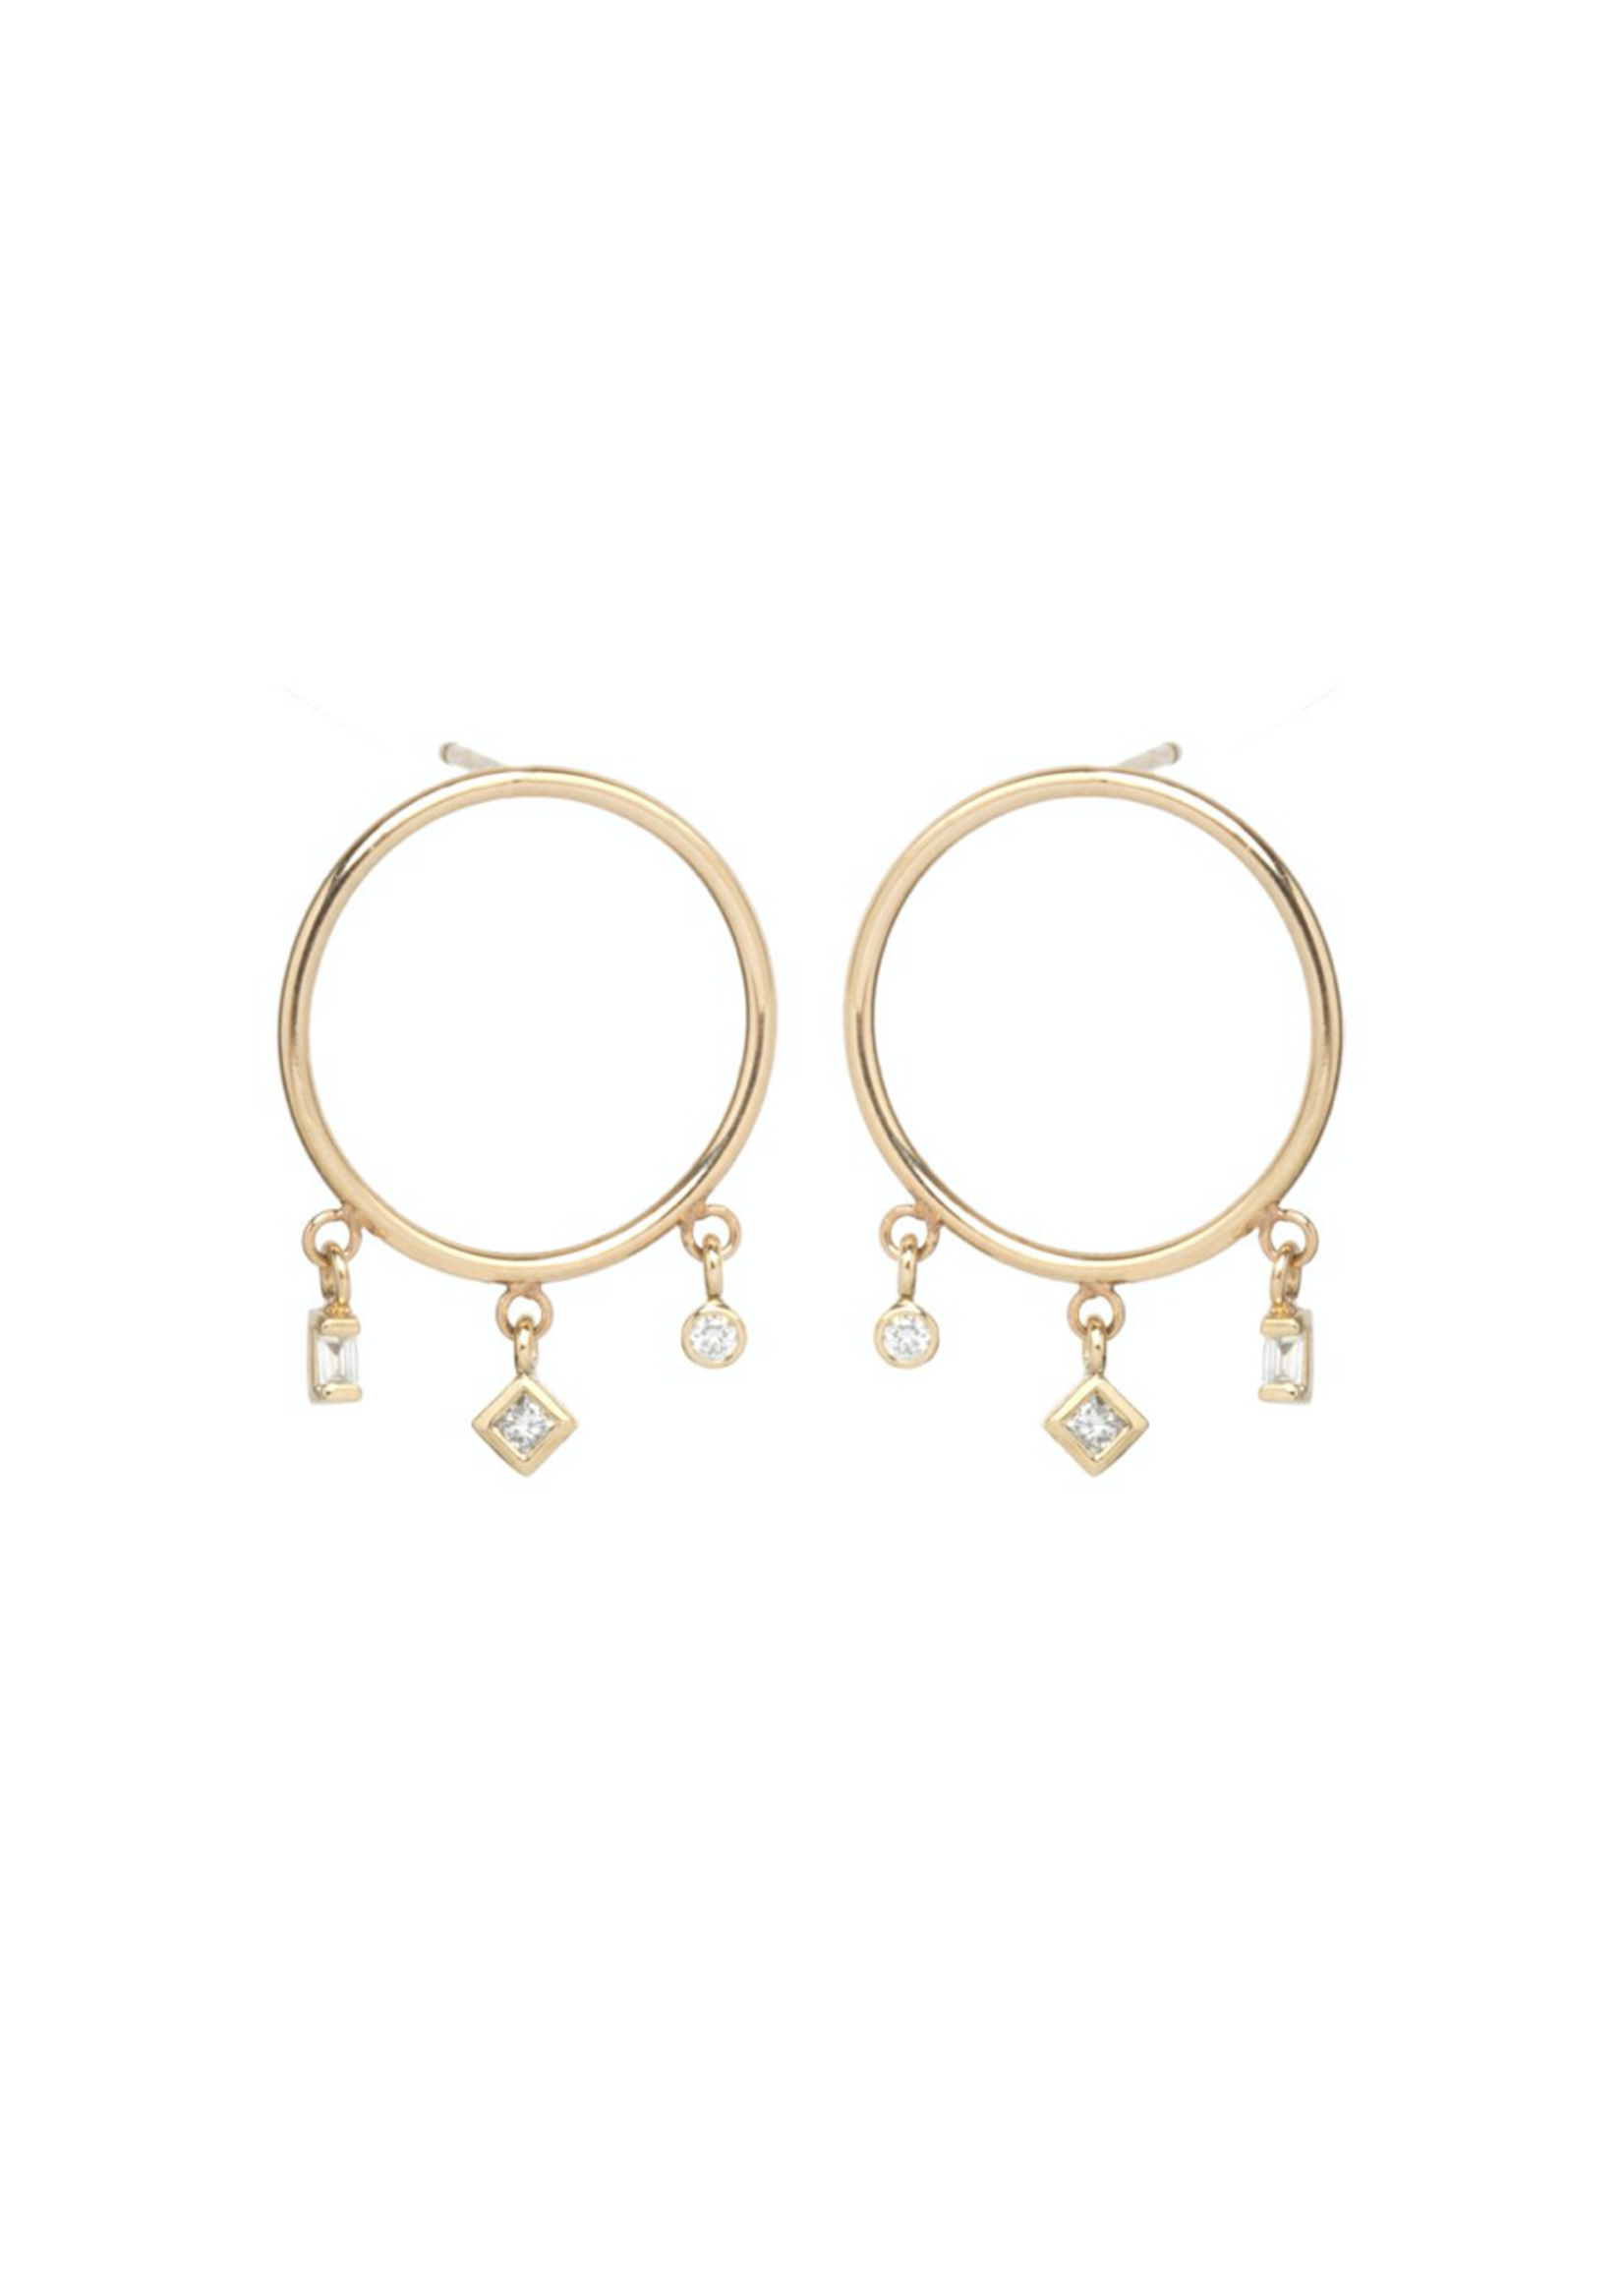 Zoe Chicco 14K Gold Small Circle Earrings